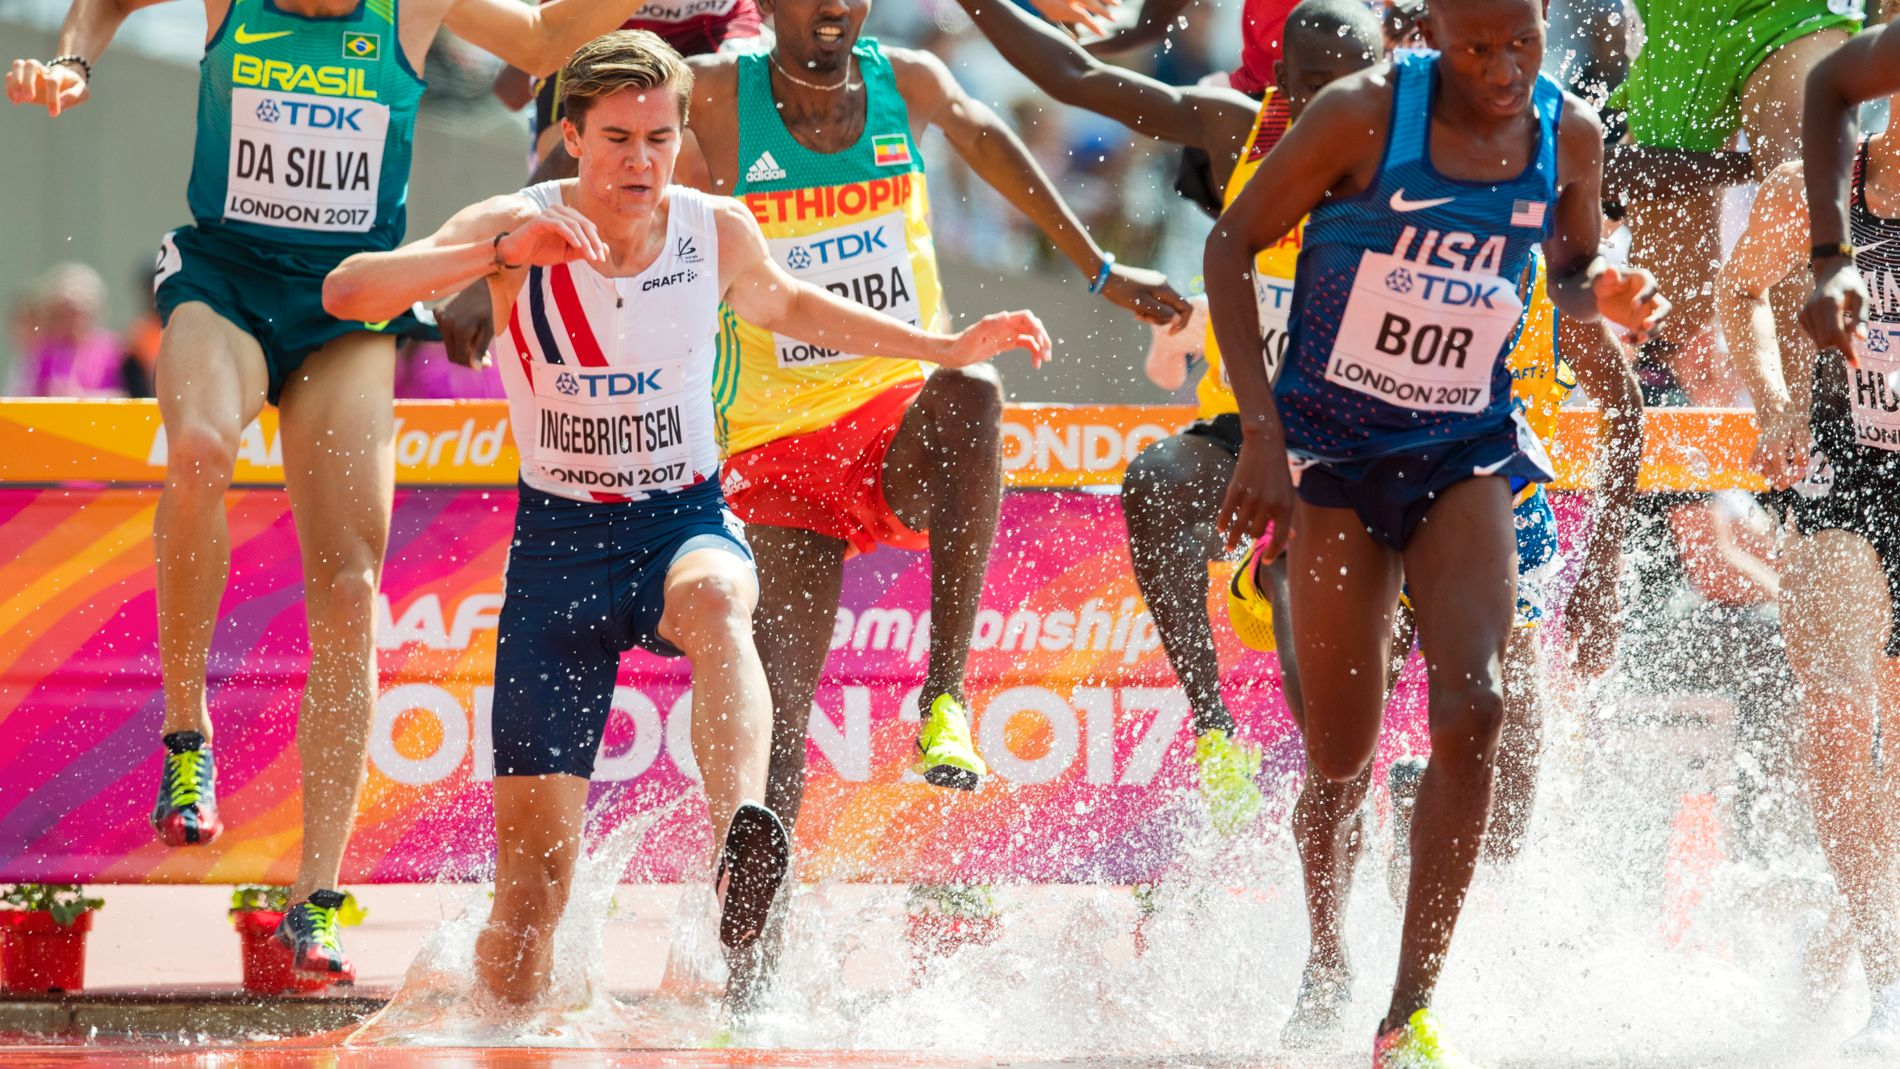 PÅ DYPT VANN: Jakob Ingebrigtsen slet voldsomt med de to siste hinderne på gårsdagens forsøksheat foran tusenvis av tilskuere på Queen Elizabeth Olympic Park i London.